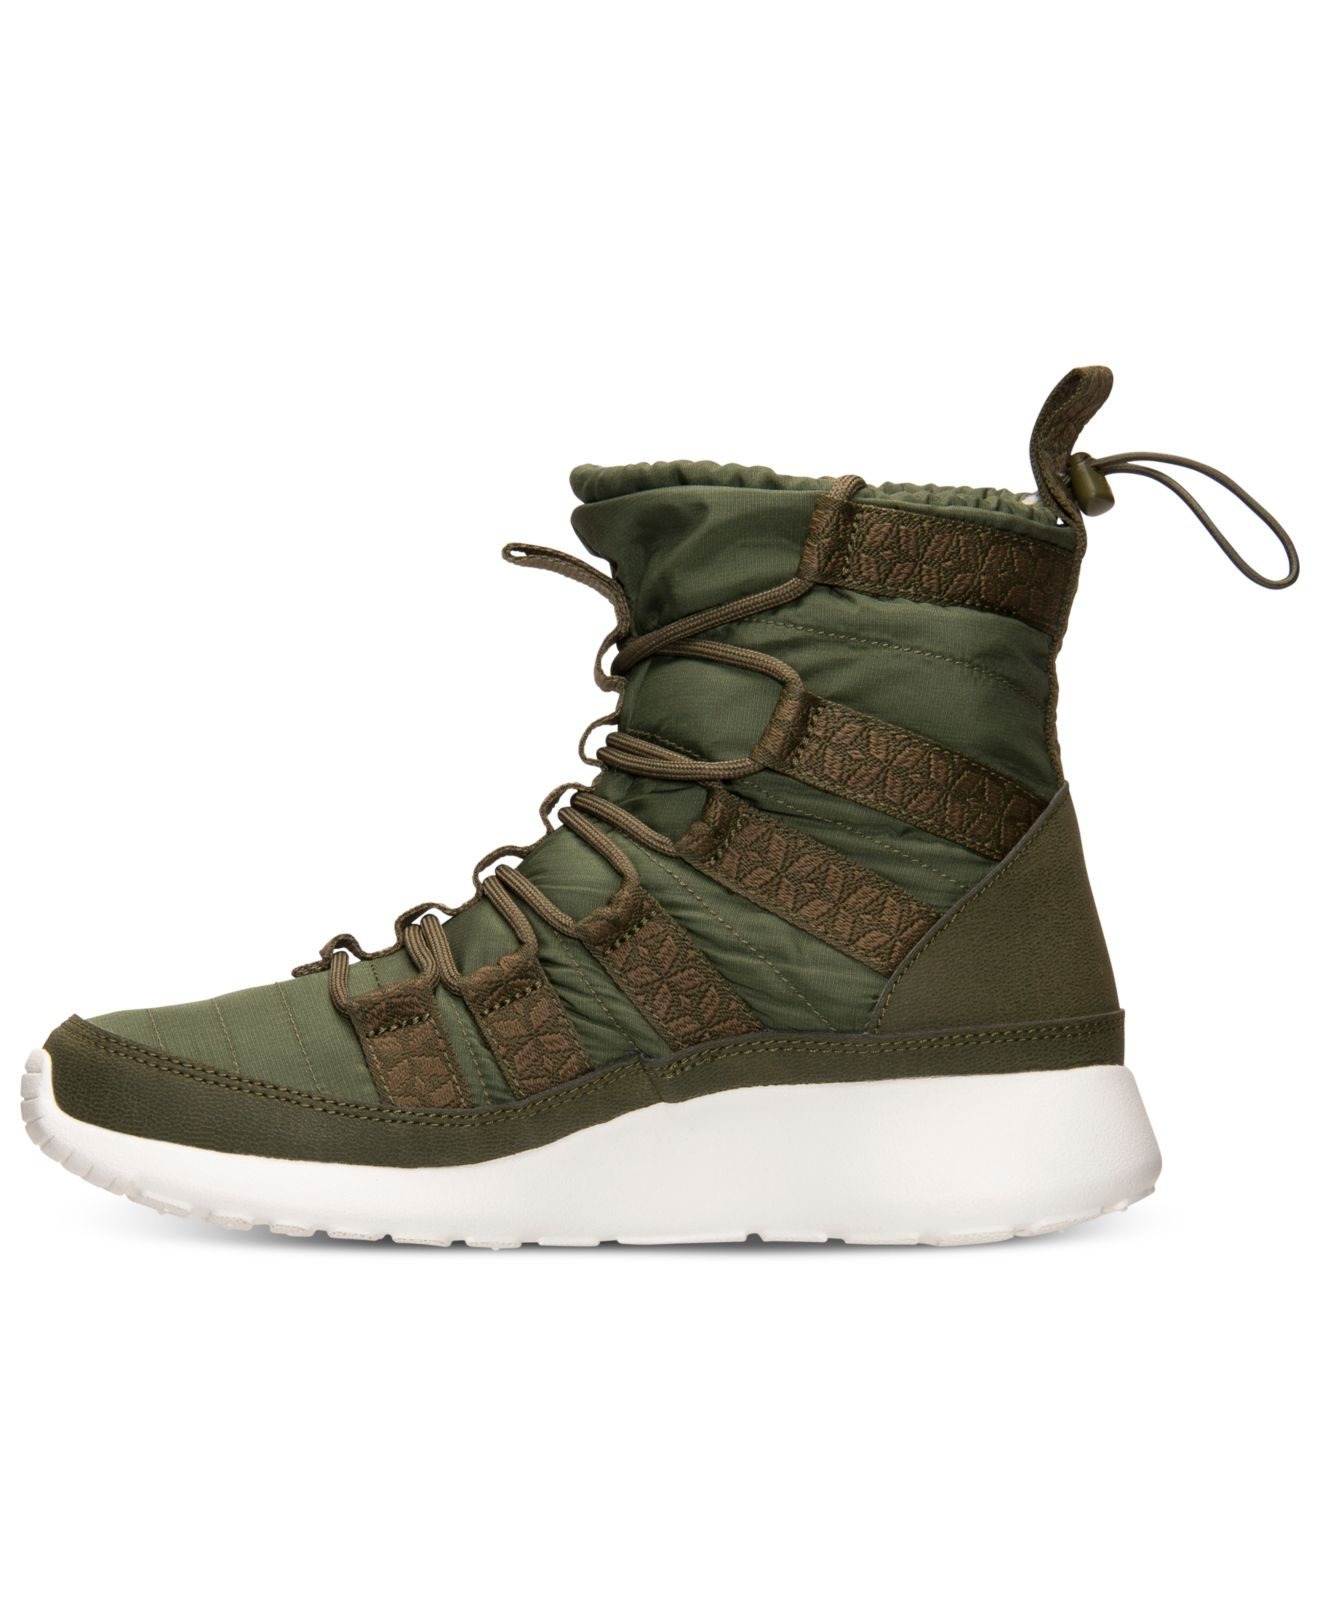 d0b99e0e31526 Lyst - Nike Women S Roshe Run Hi Sneakerboots From Finish Line in Green